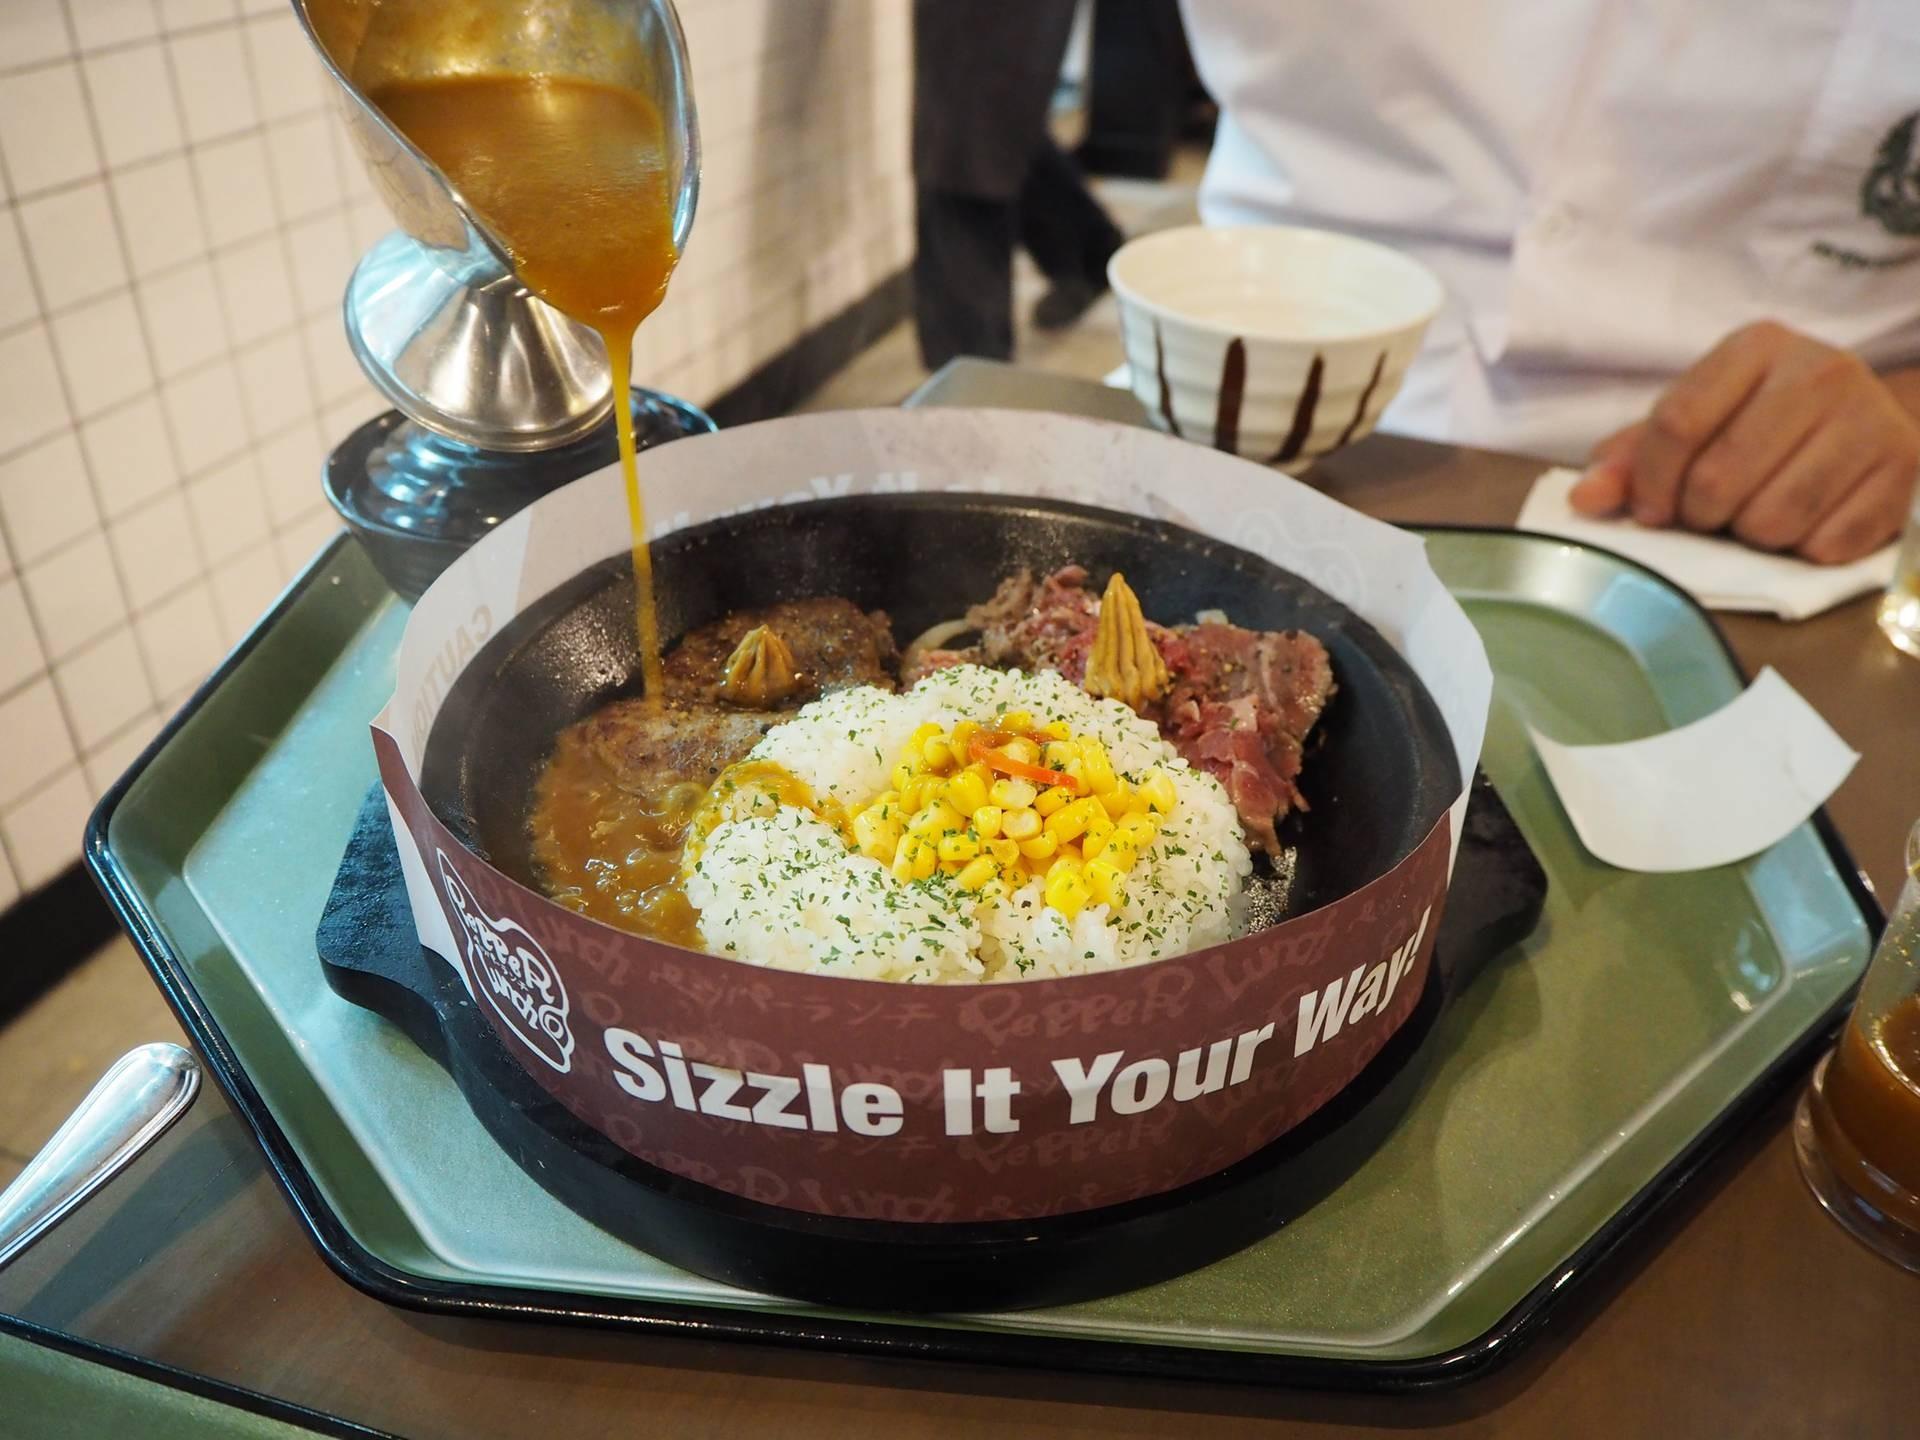 Pepper Lunch เซ็นทรัลเวิลด์